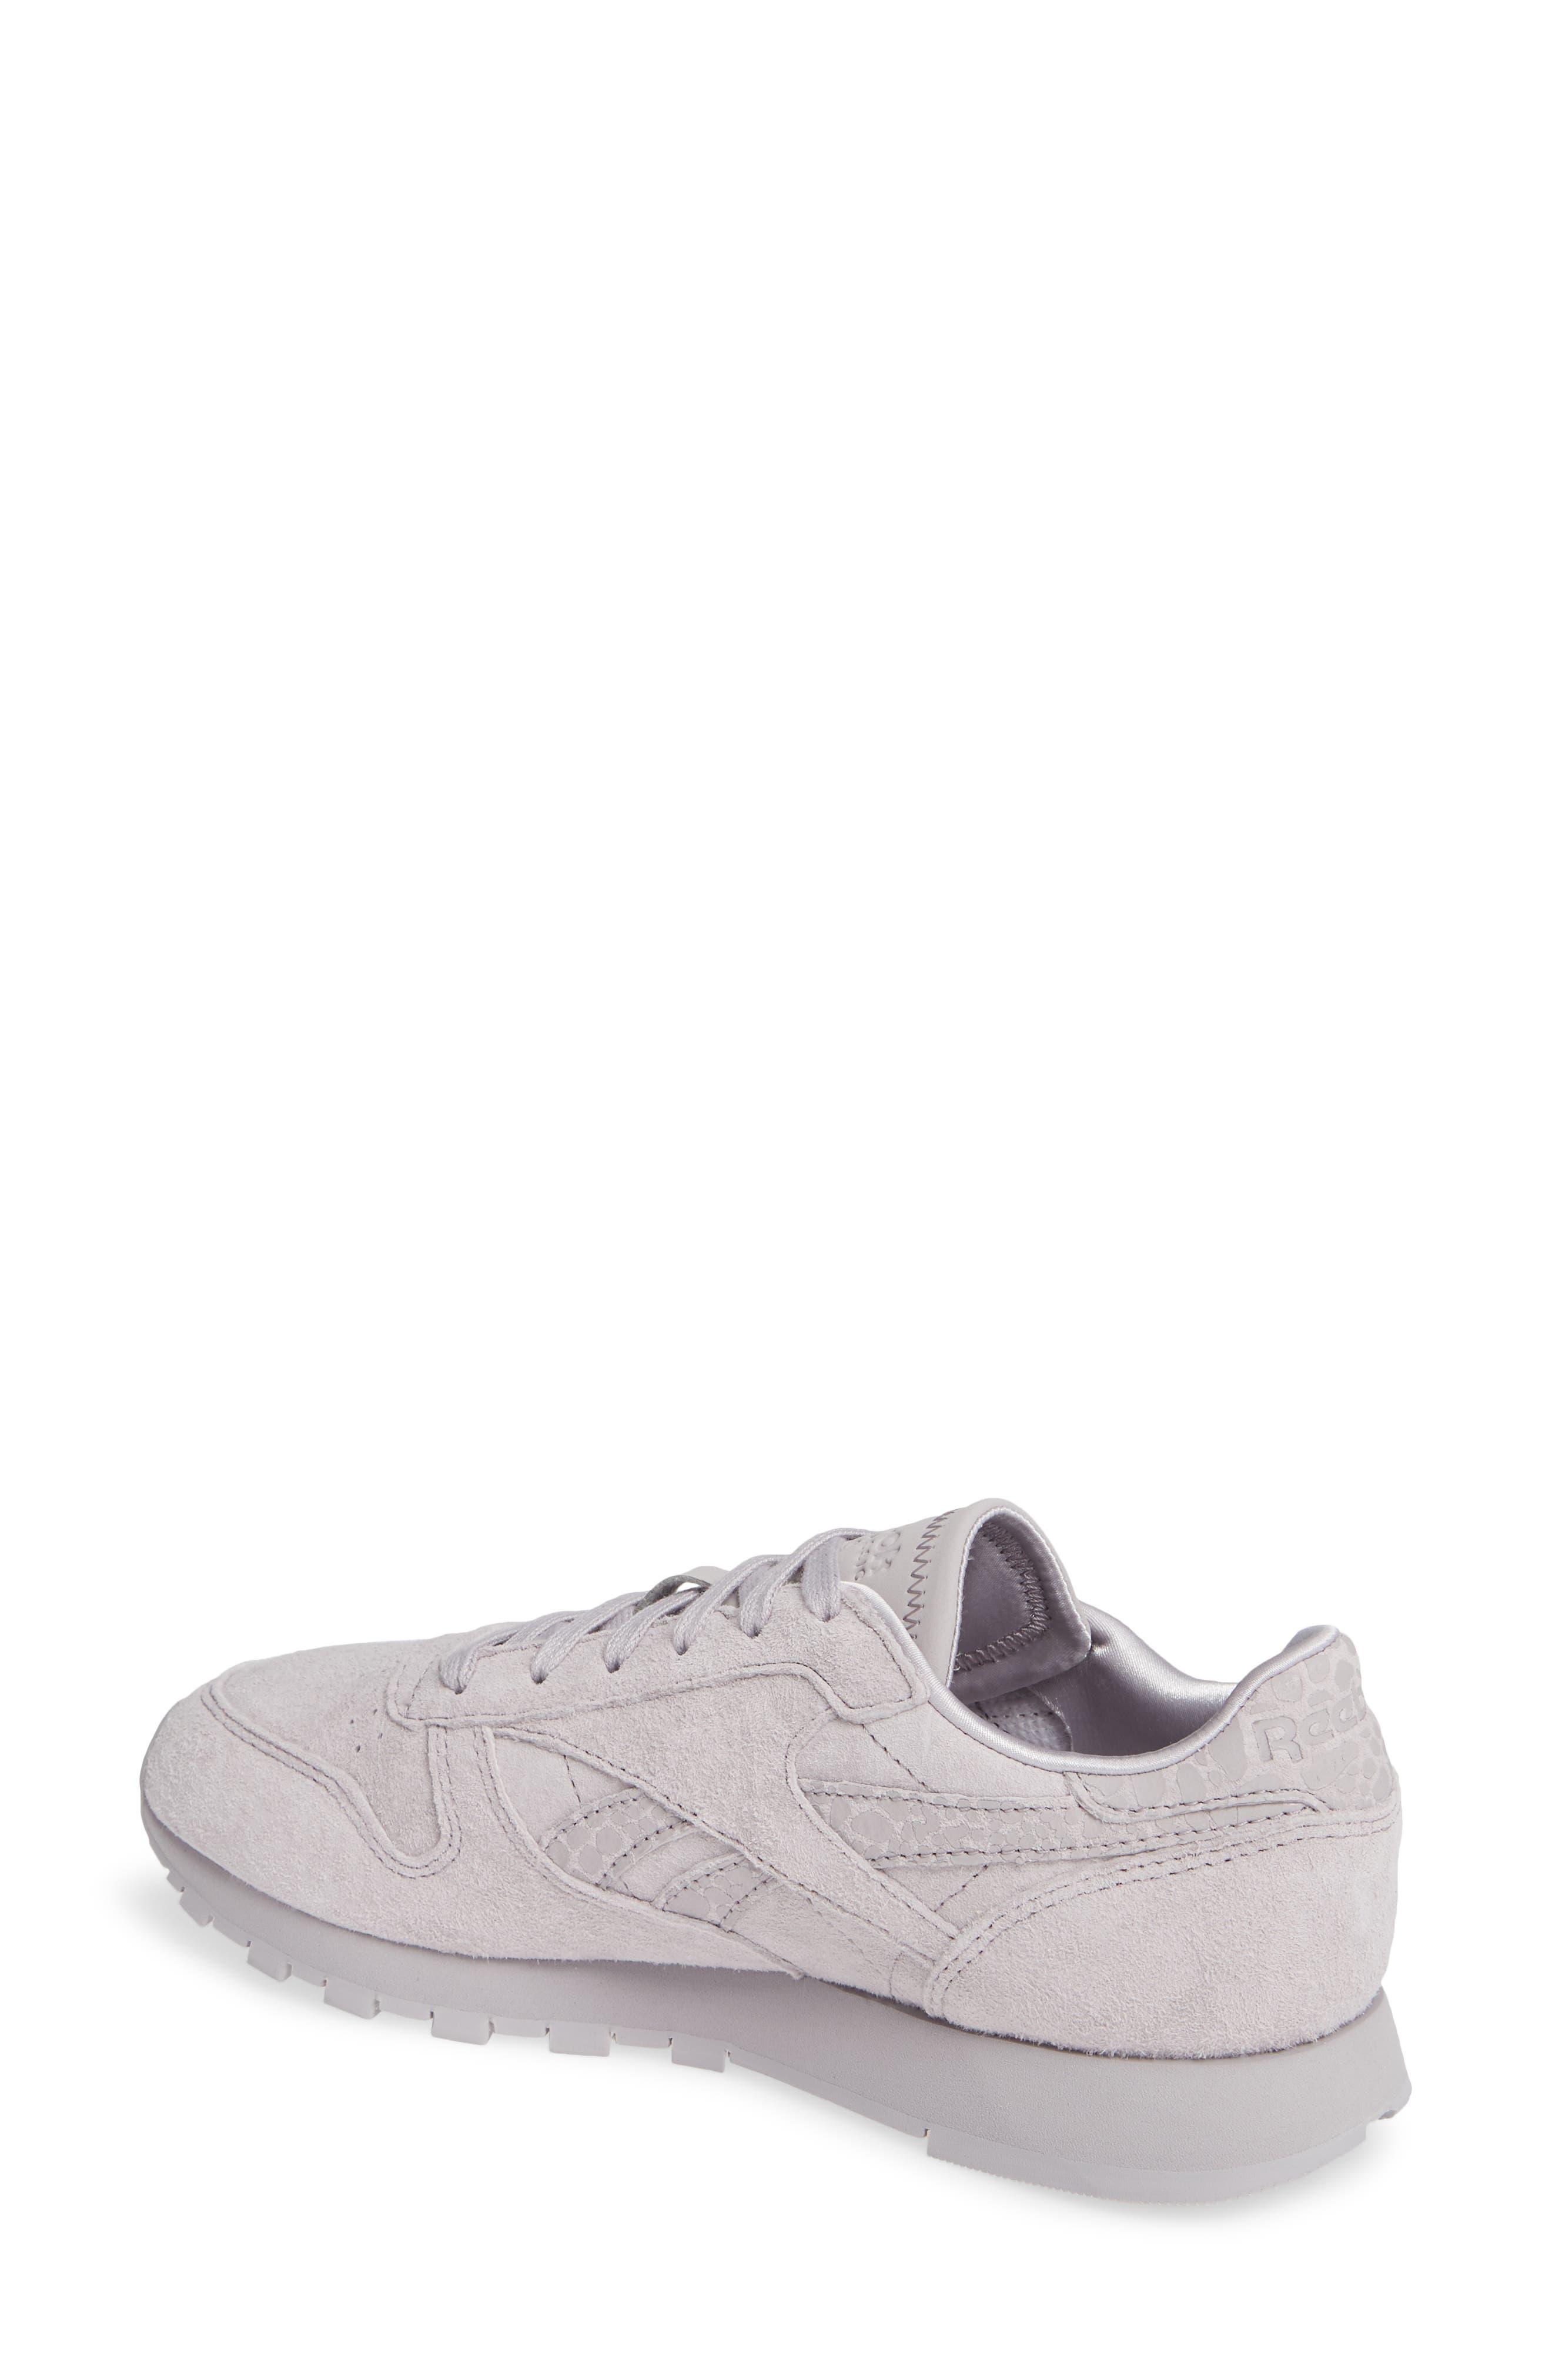 REEBOK,                             Classic Leather Sneaker,                             Alternate thumbnail 2, color,                             WHISPER GREY